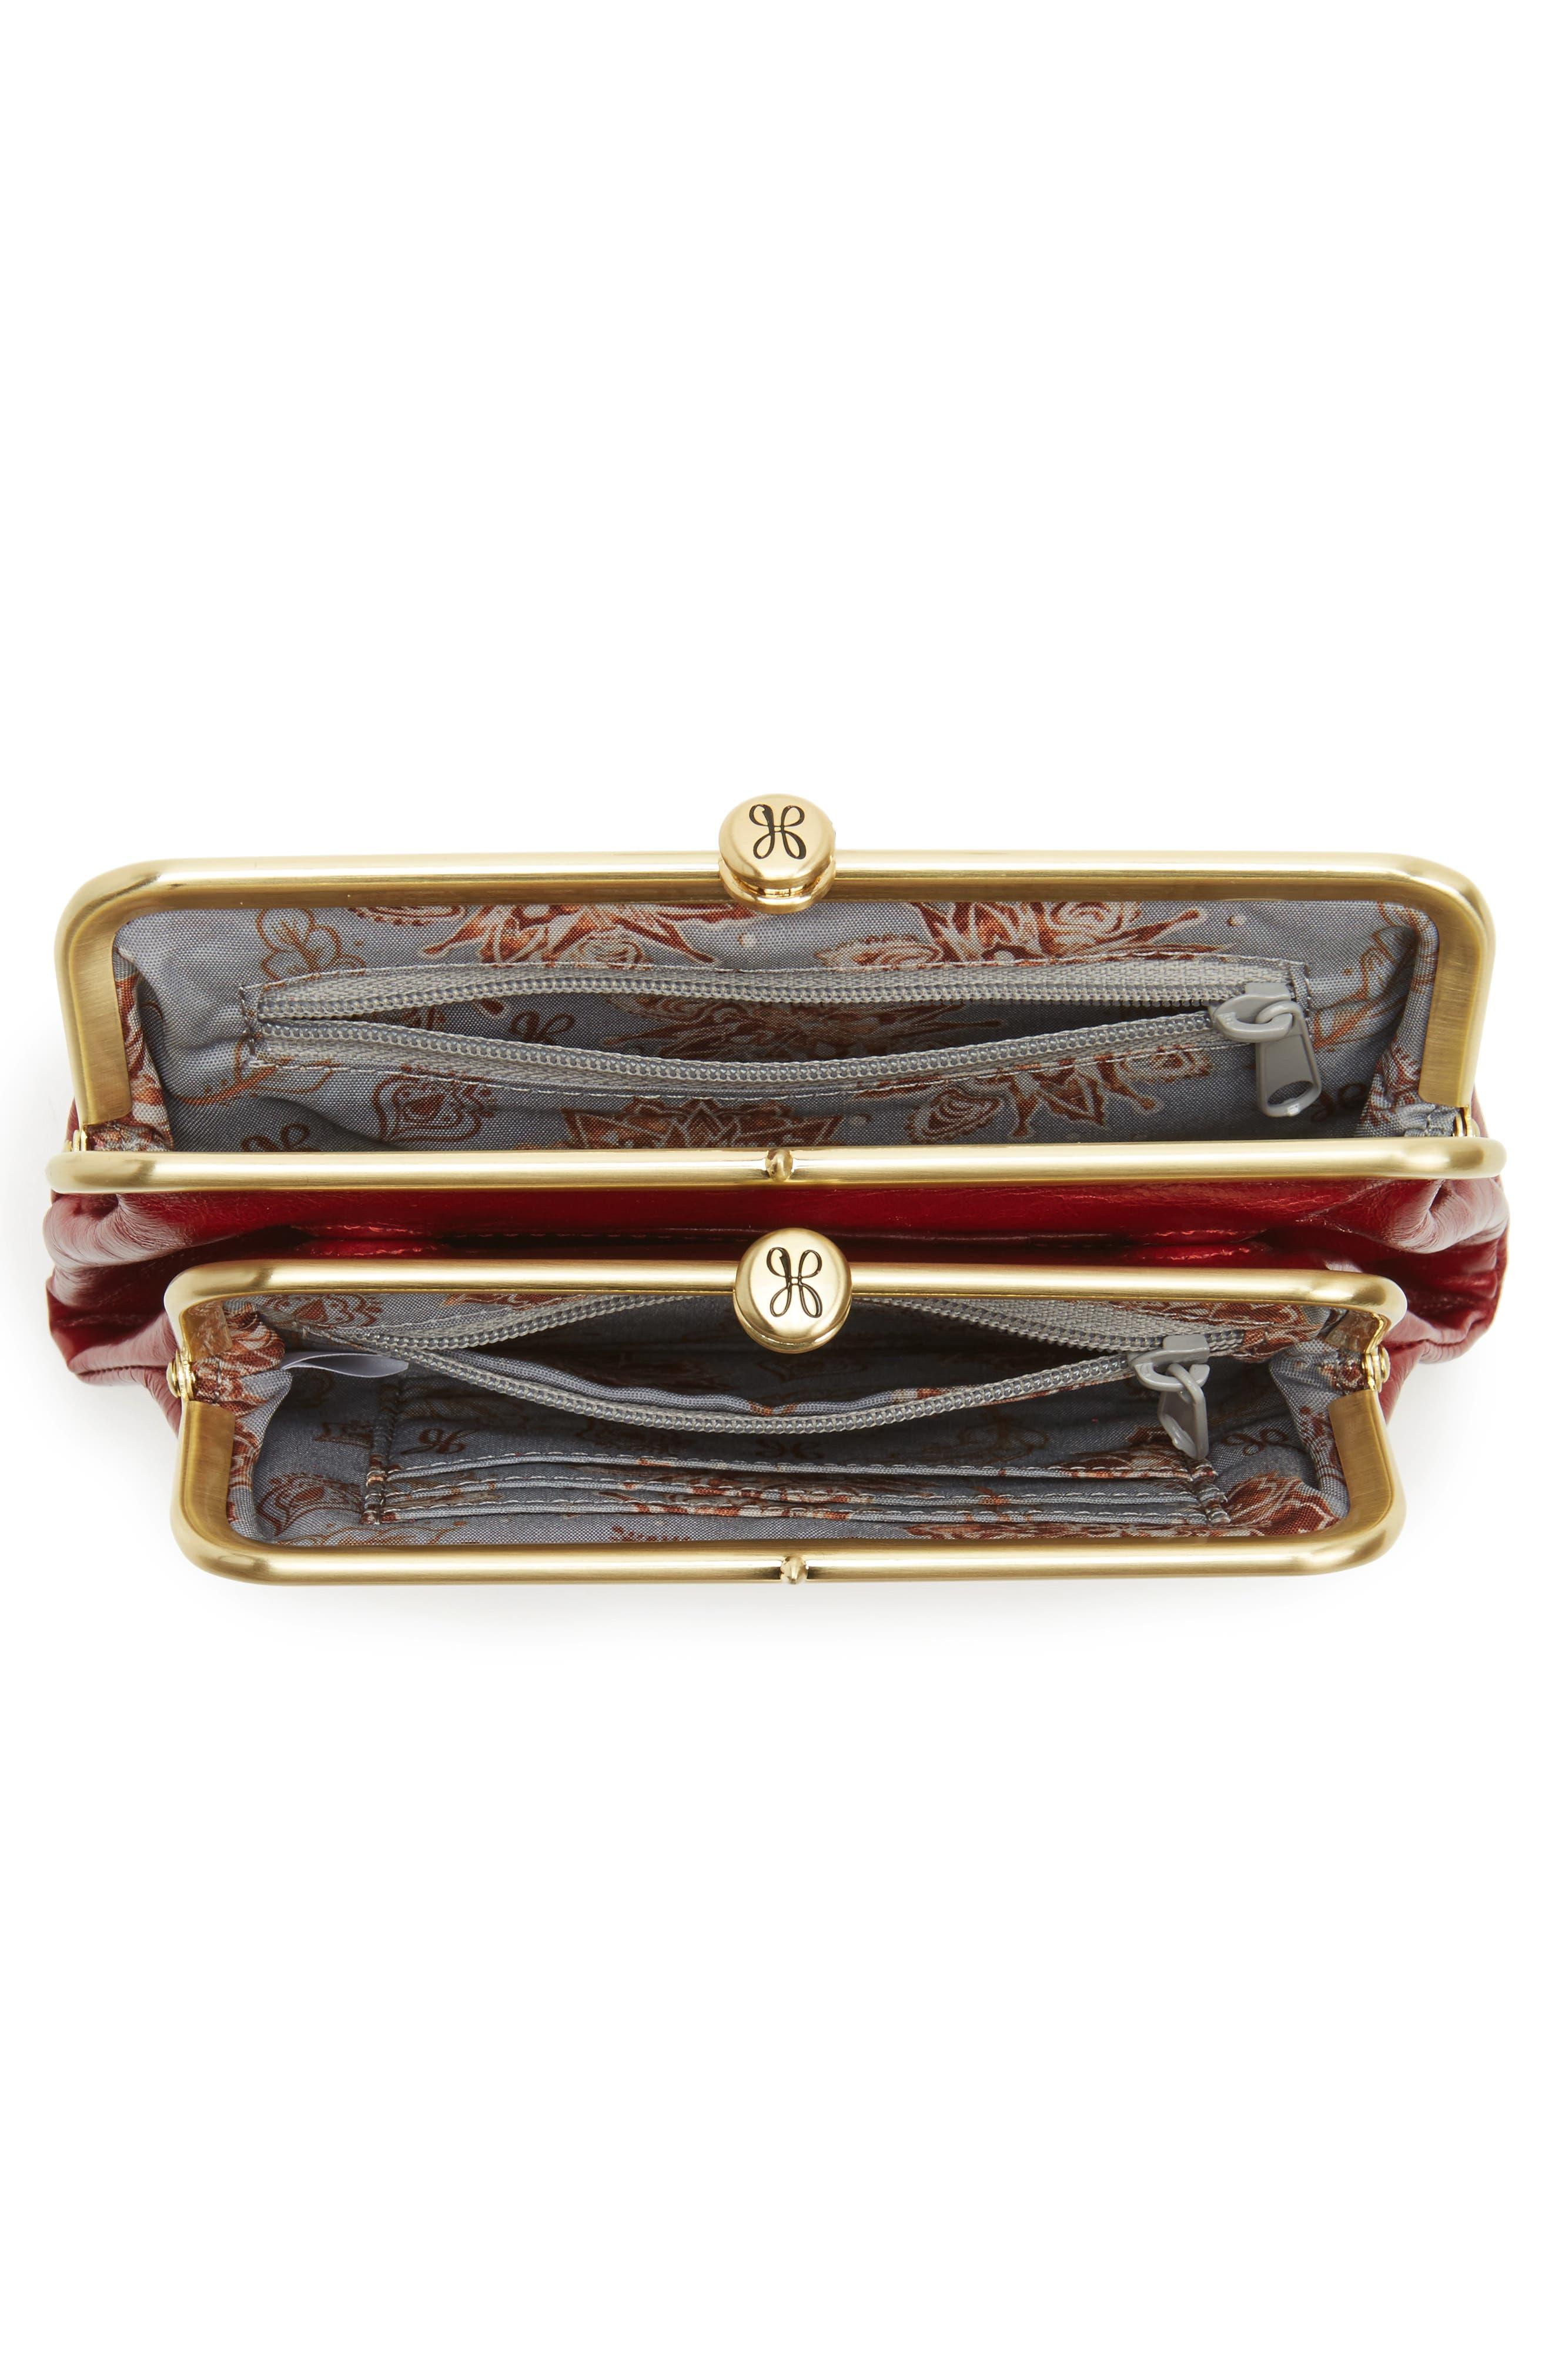 Suzette Calfskin Leather Wallet,                             Alternate thumbnail 2, color,                             Cardinal